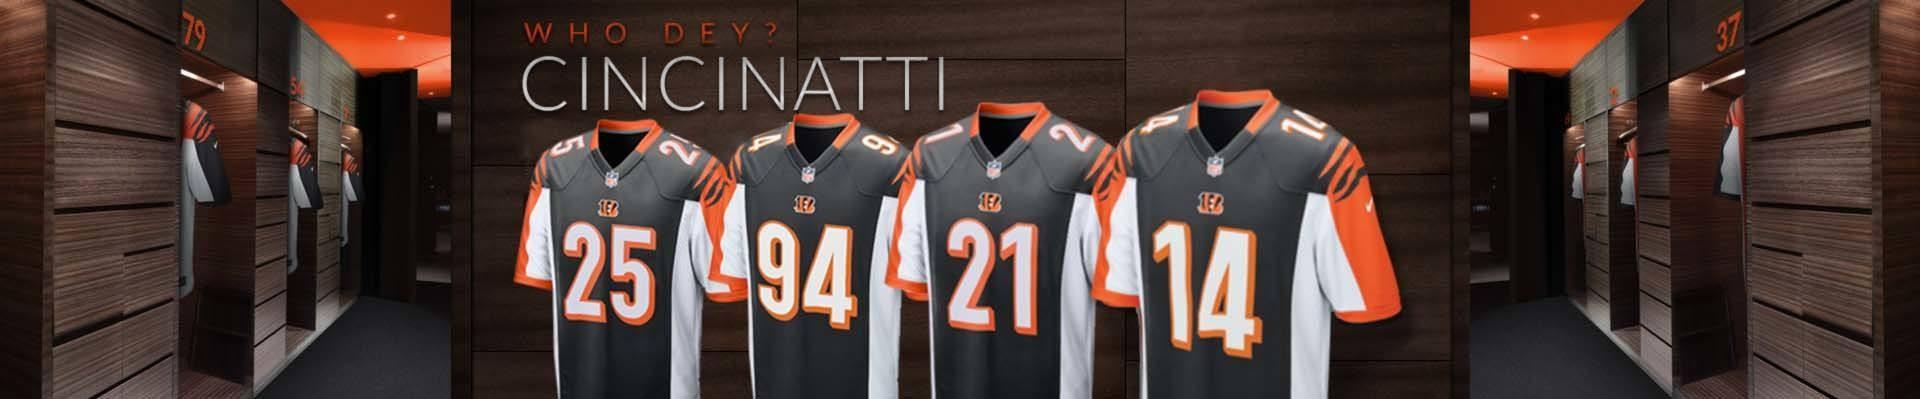 NFL Jersey's Youth Cincinnati Bengals Brandon Tate Team Color Jersey